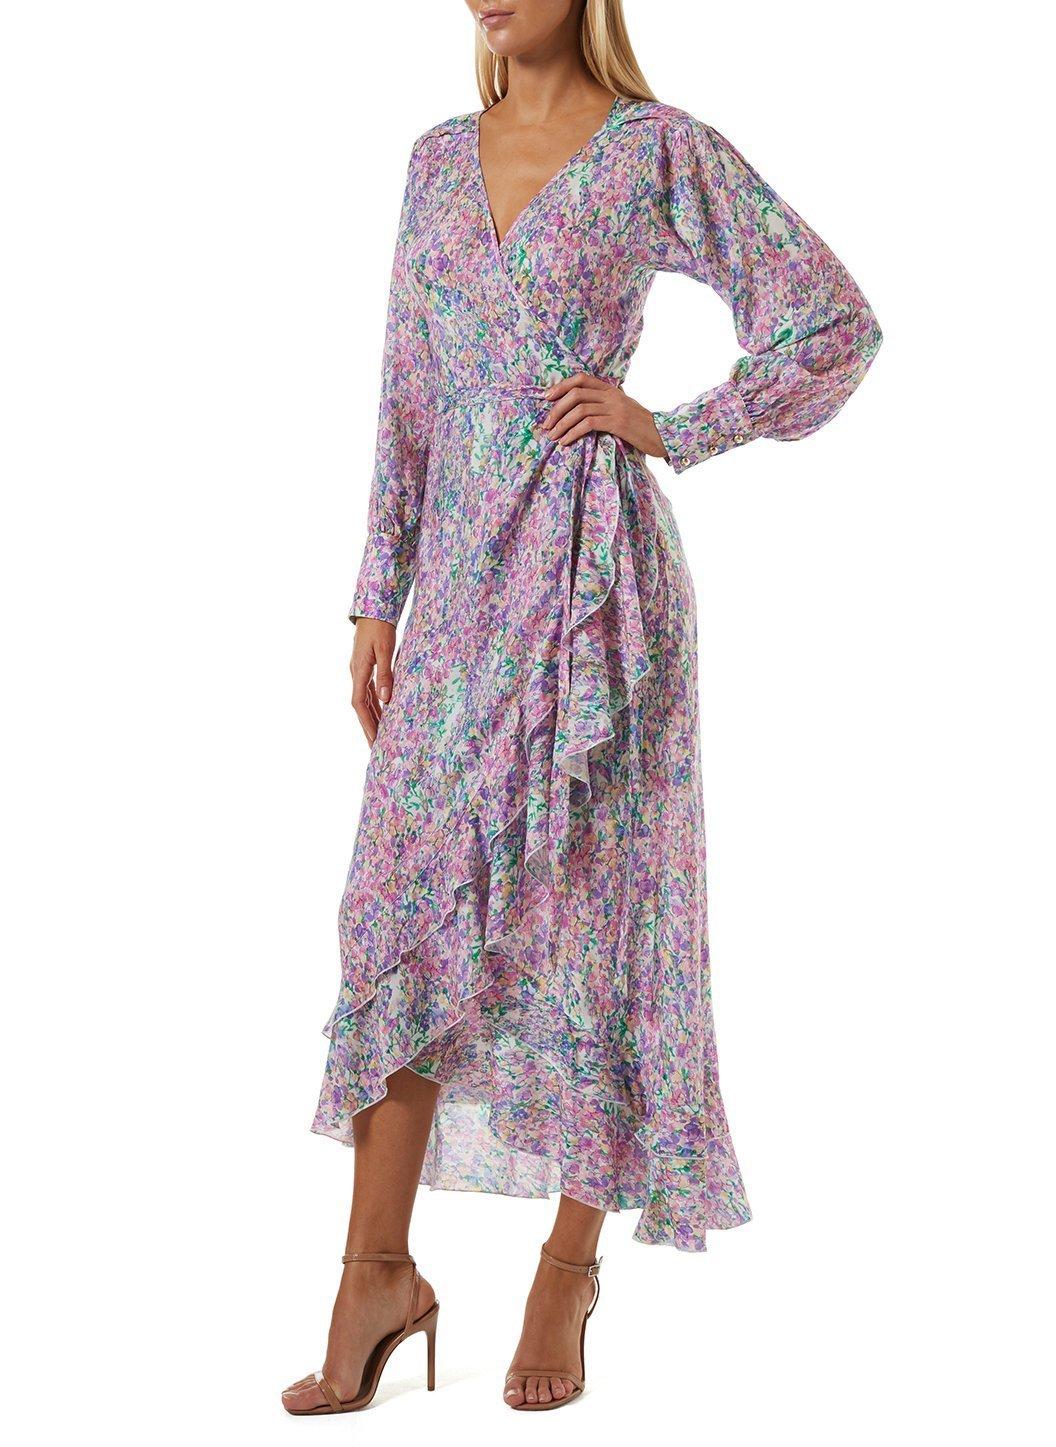 Macaw_Bouquet_Dress_F_1056x.progressive-2